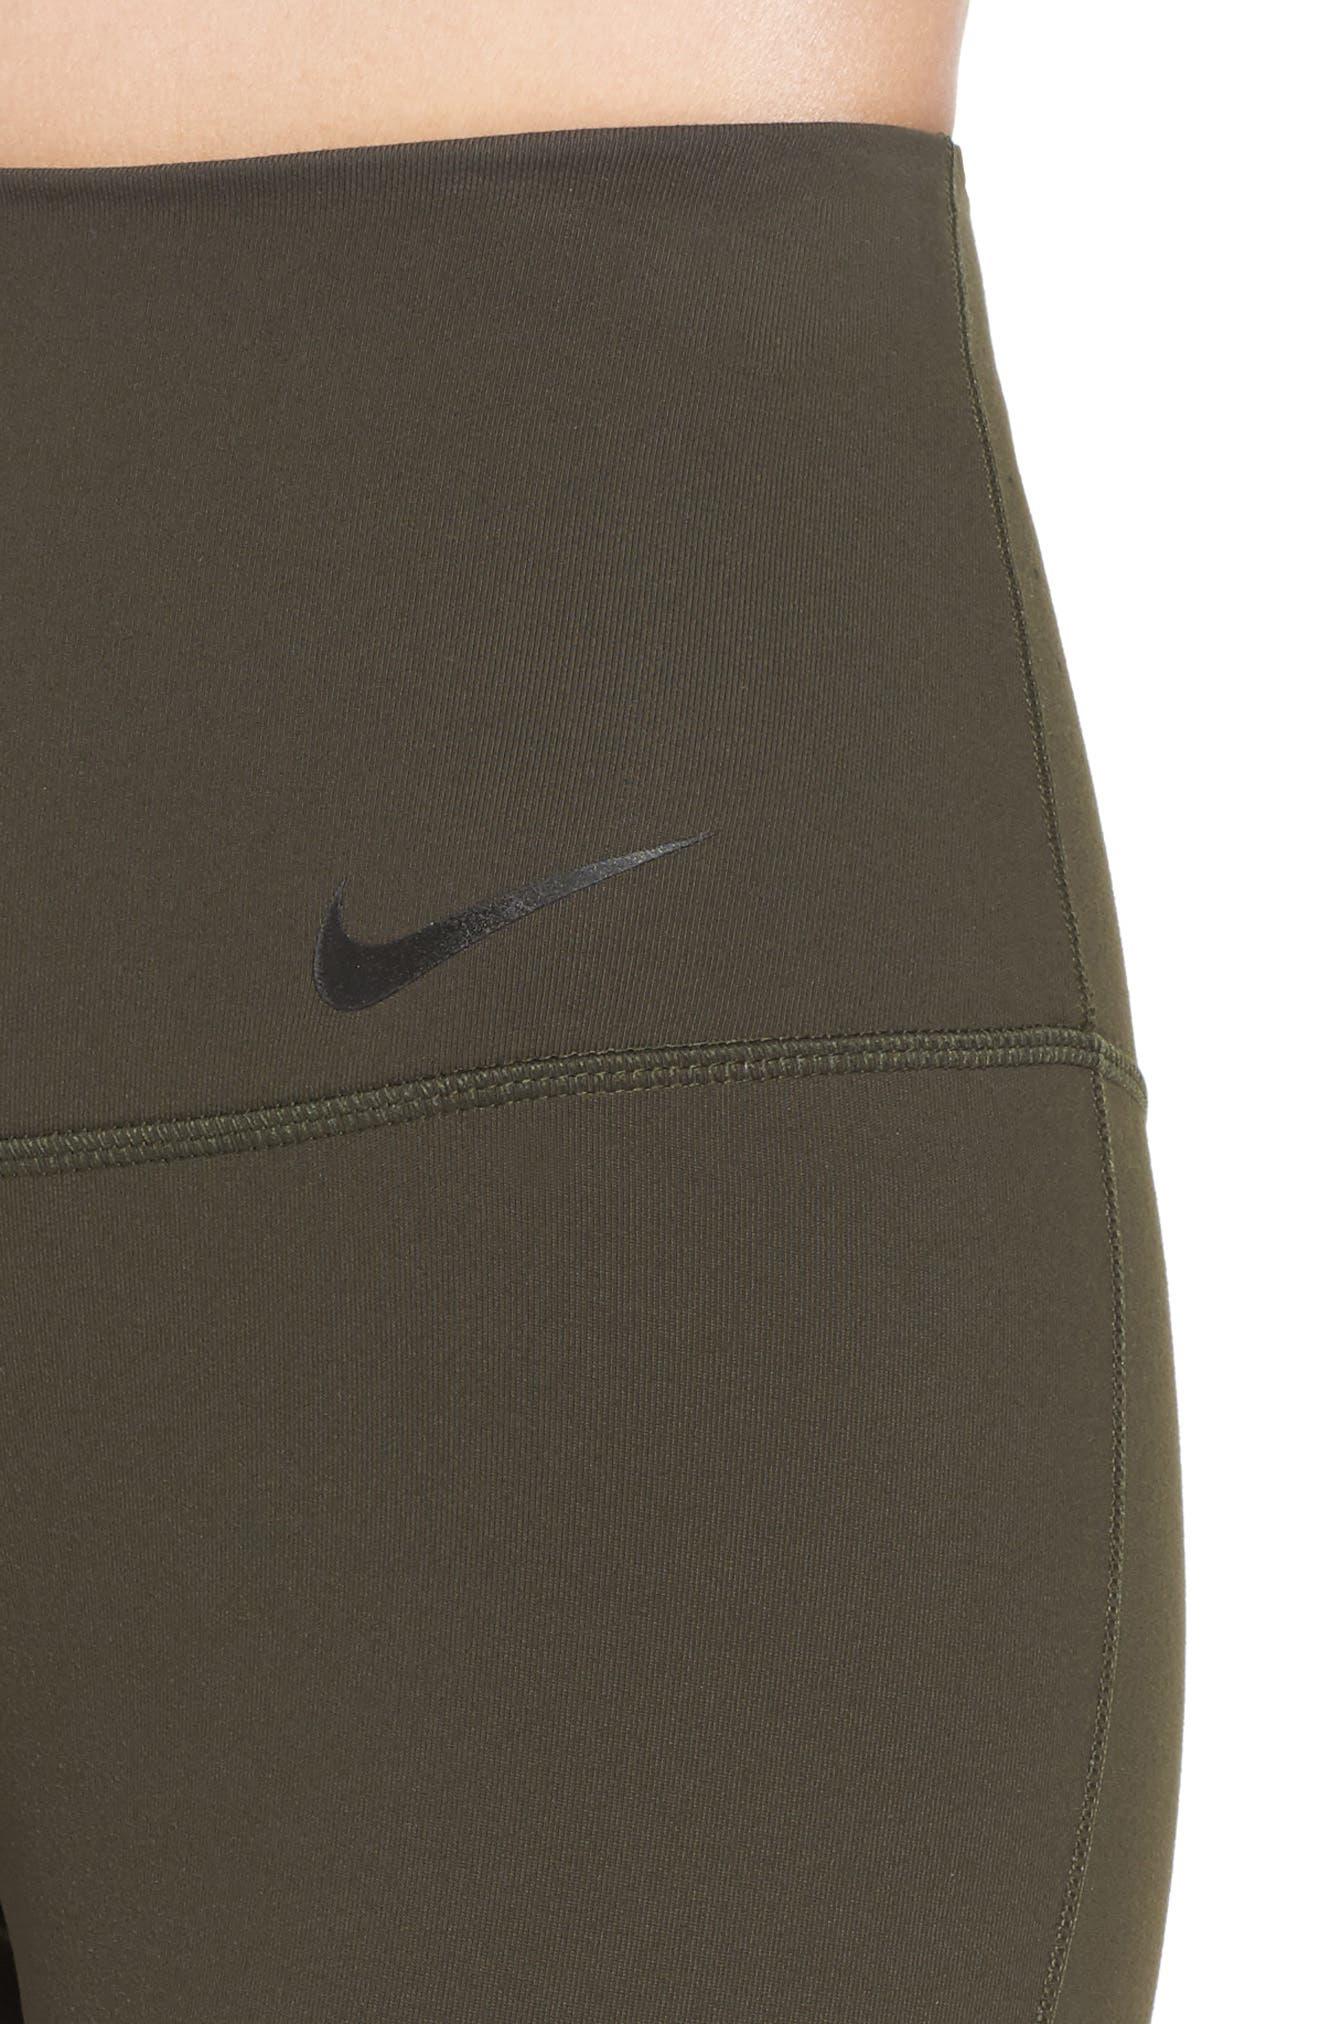 Alternate Image 4  - Nike Legendary High Rise Capris